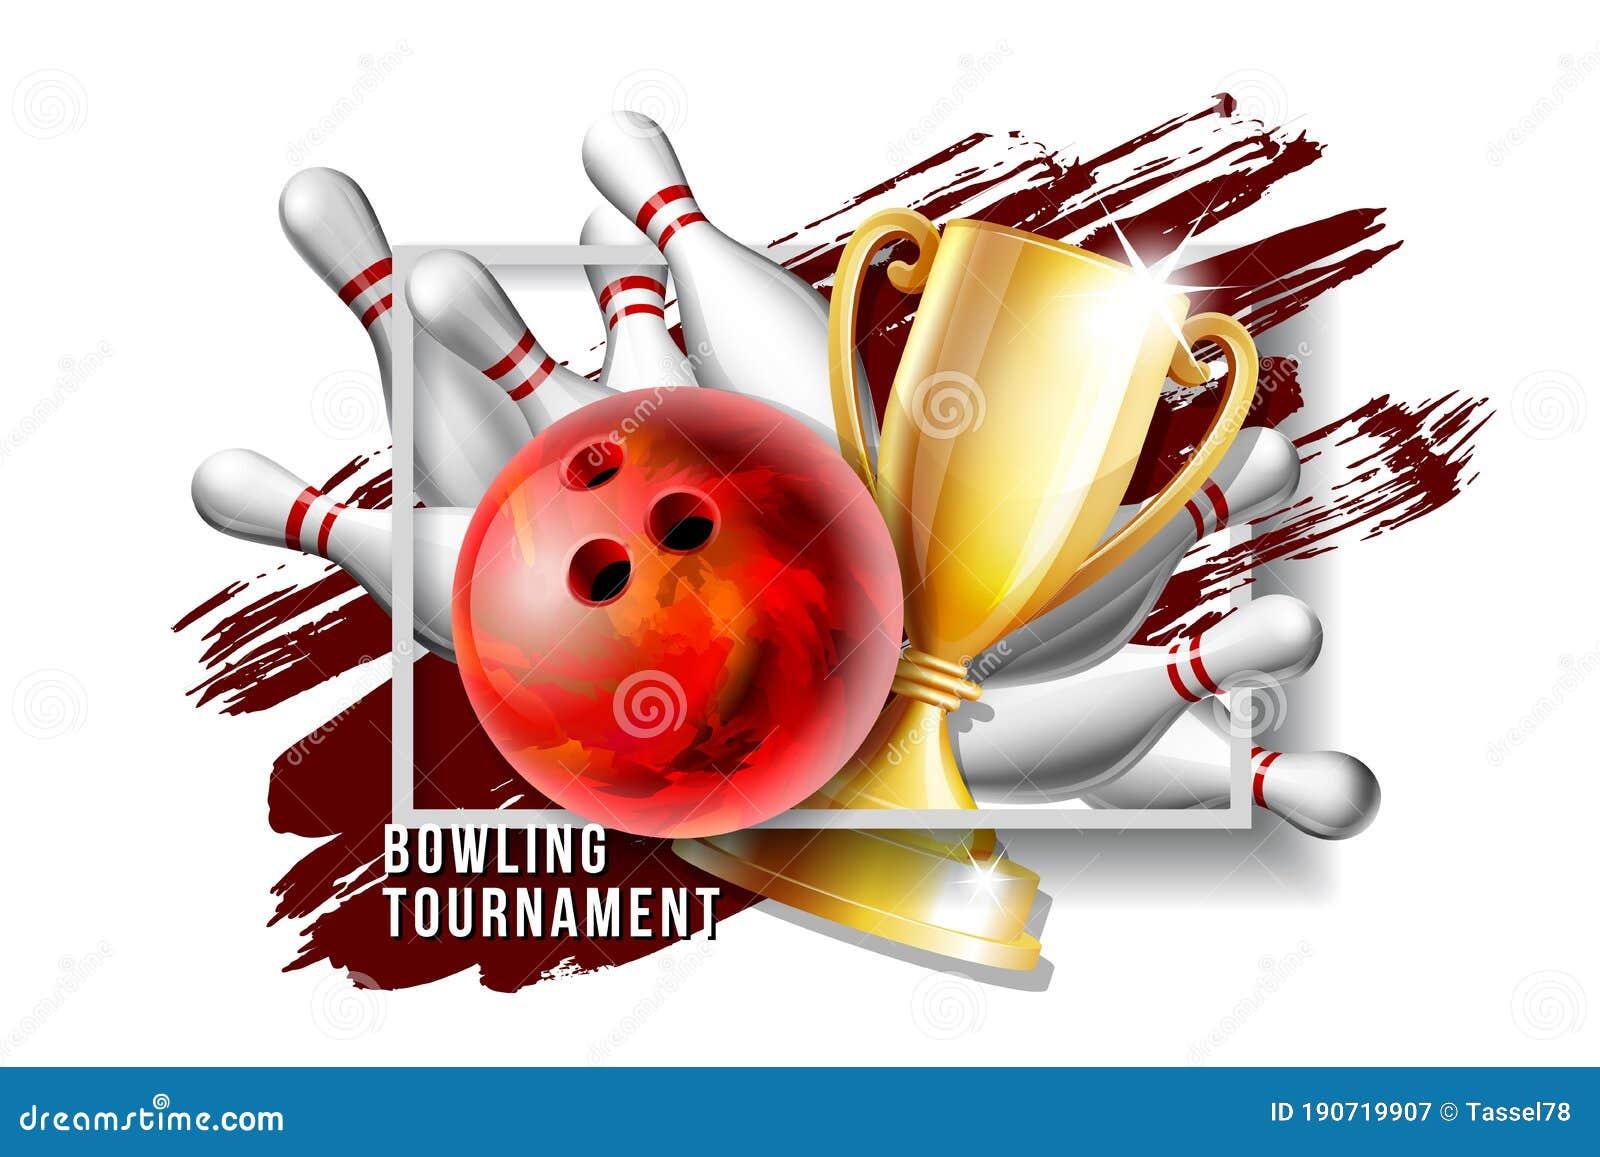 Golden Bowling Pins Stock Illustrations 49 Golden Bowling Pins Stock Illustrations Vectors Clipart Dreamstime